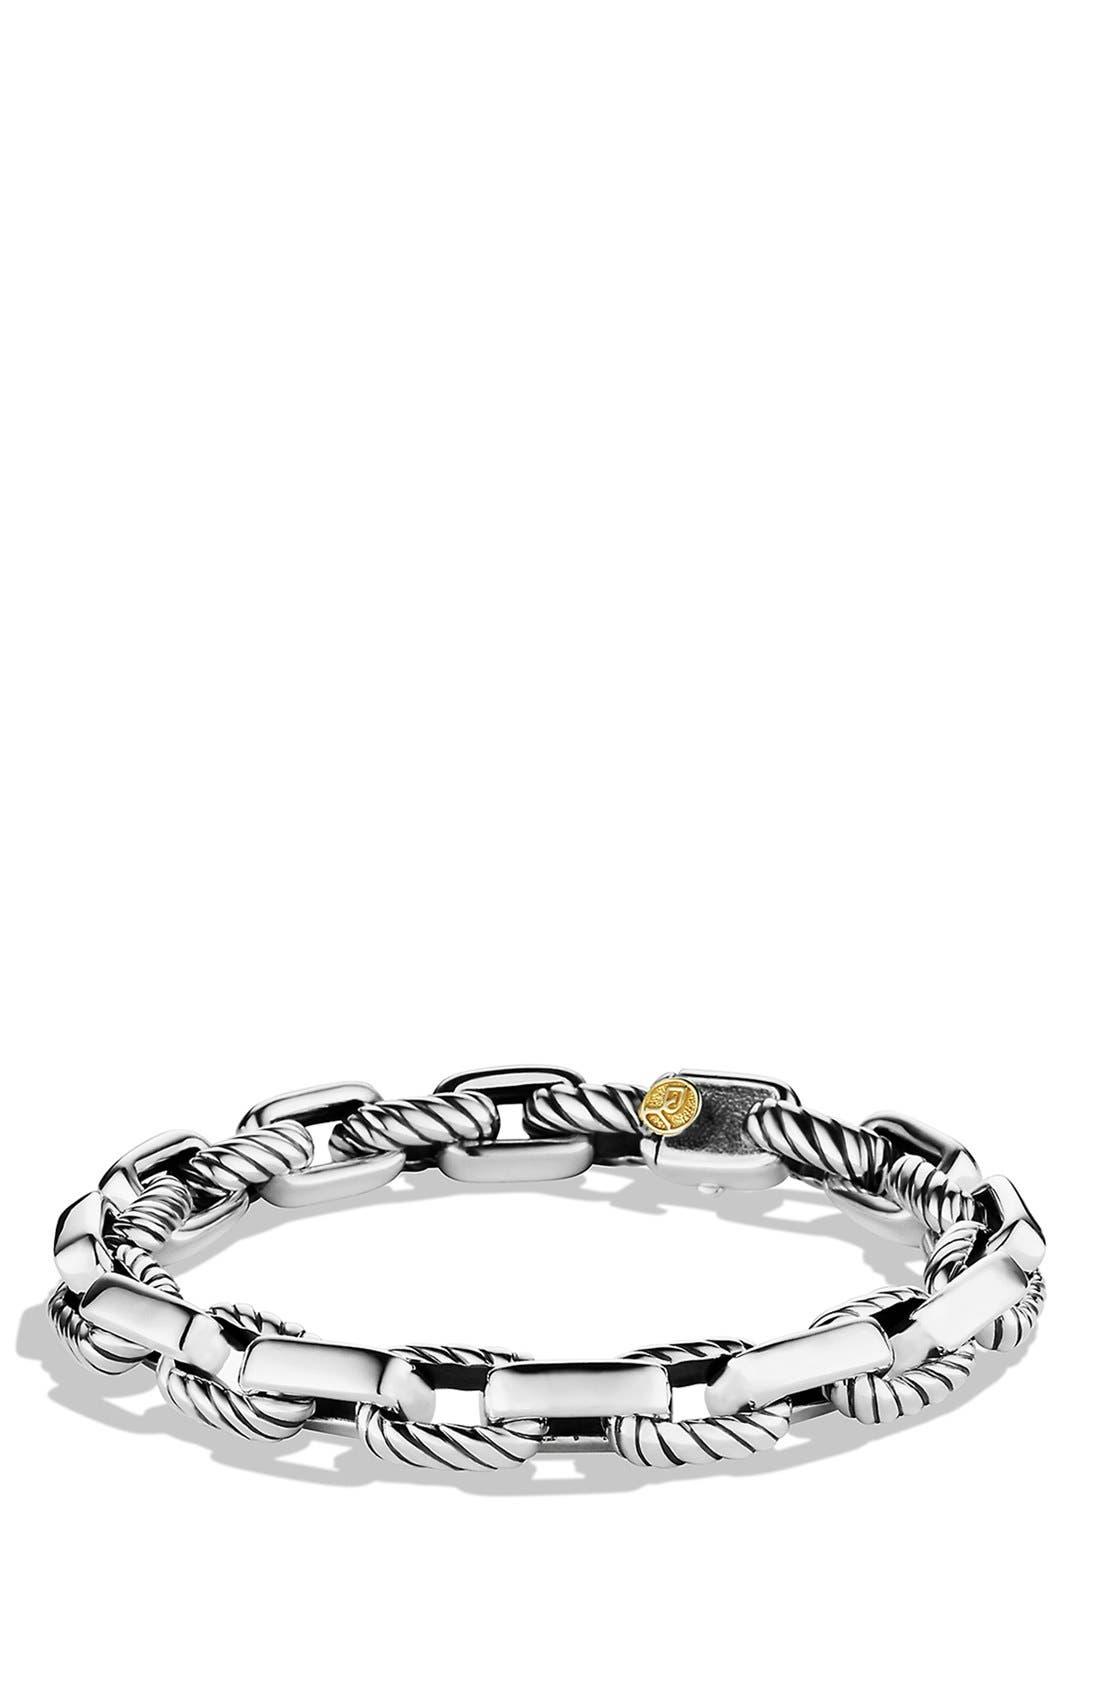 Main Image - David Yurman 'Chain' Empire Link Bracelet with Gold